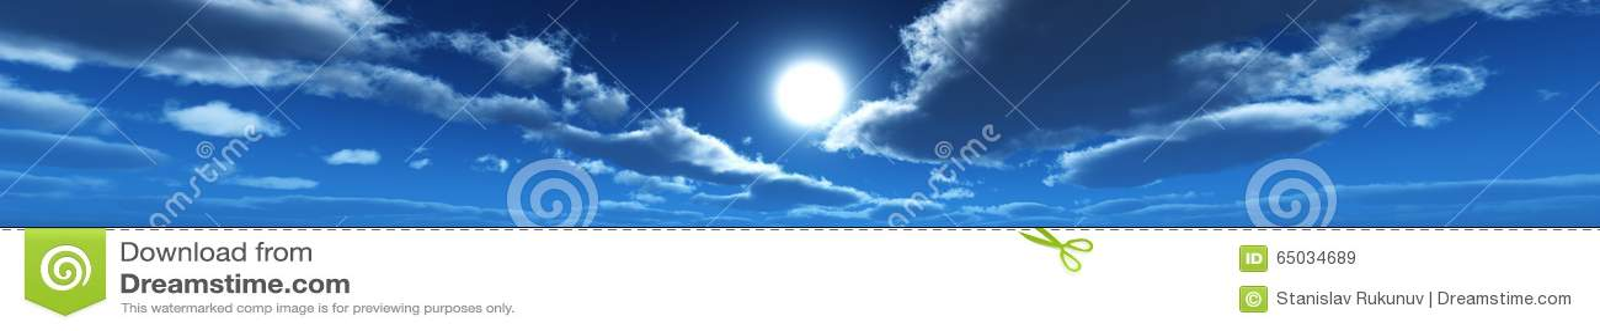 Панорама облаков, солнце среди облаков